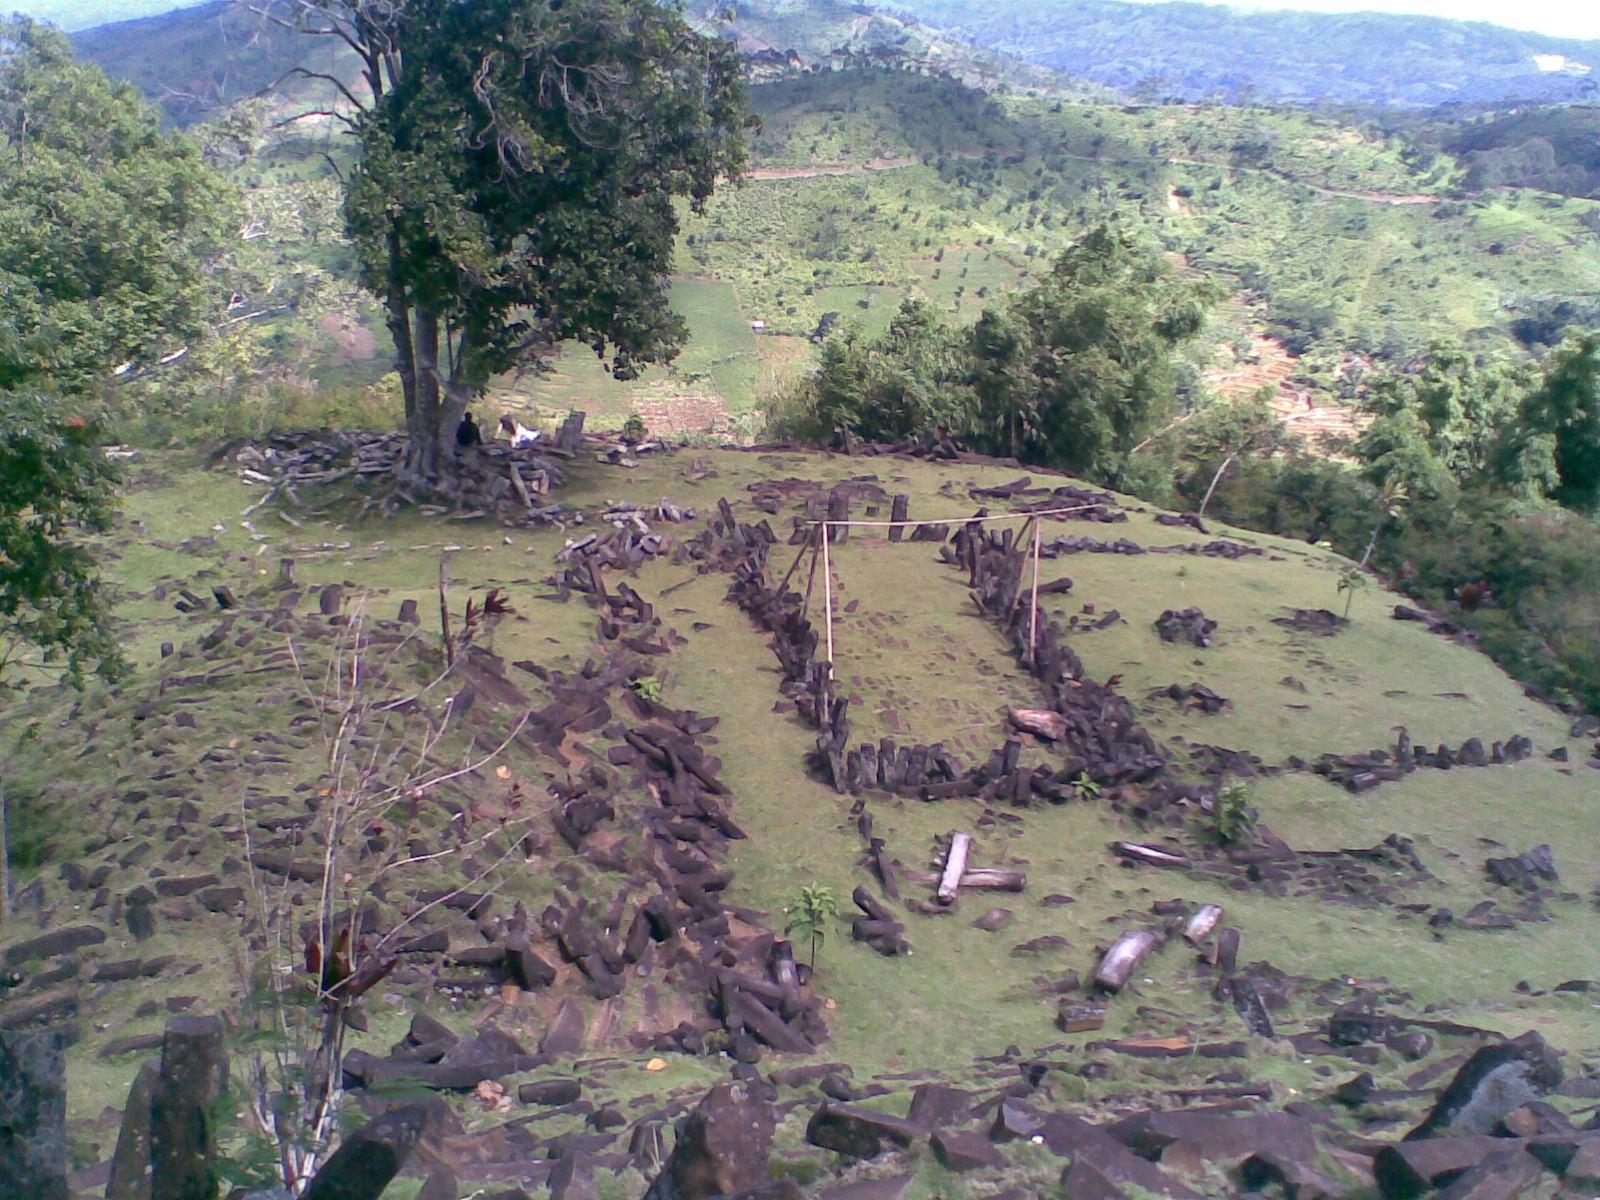 Situs gunung padang kabupaten cianjur